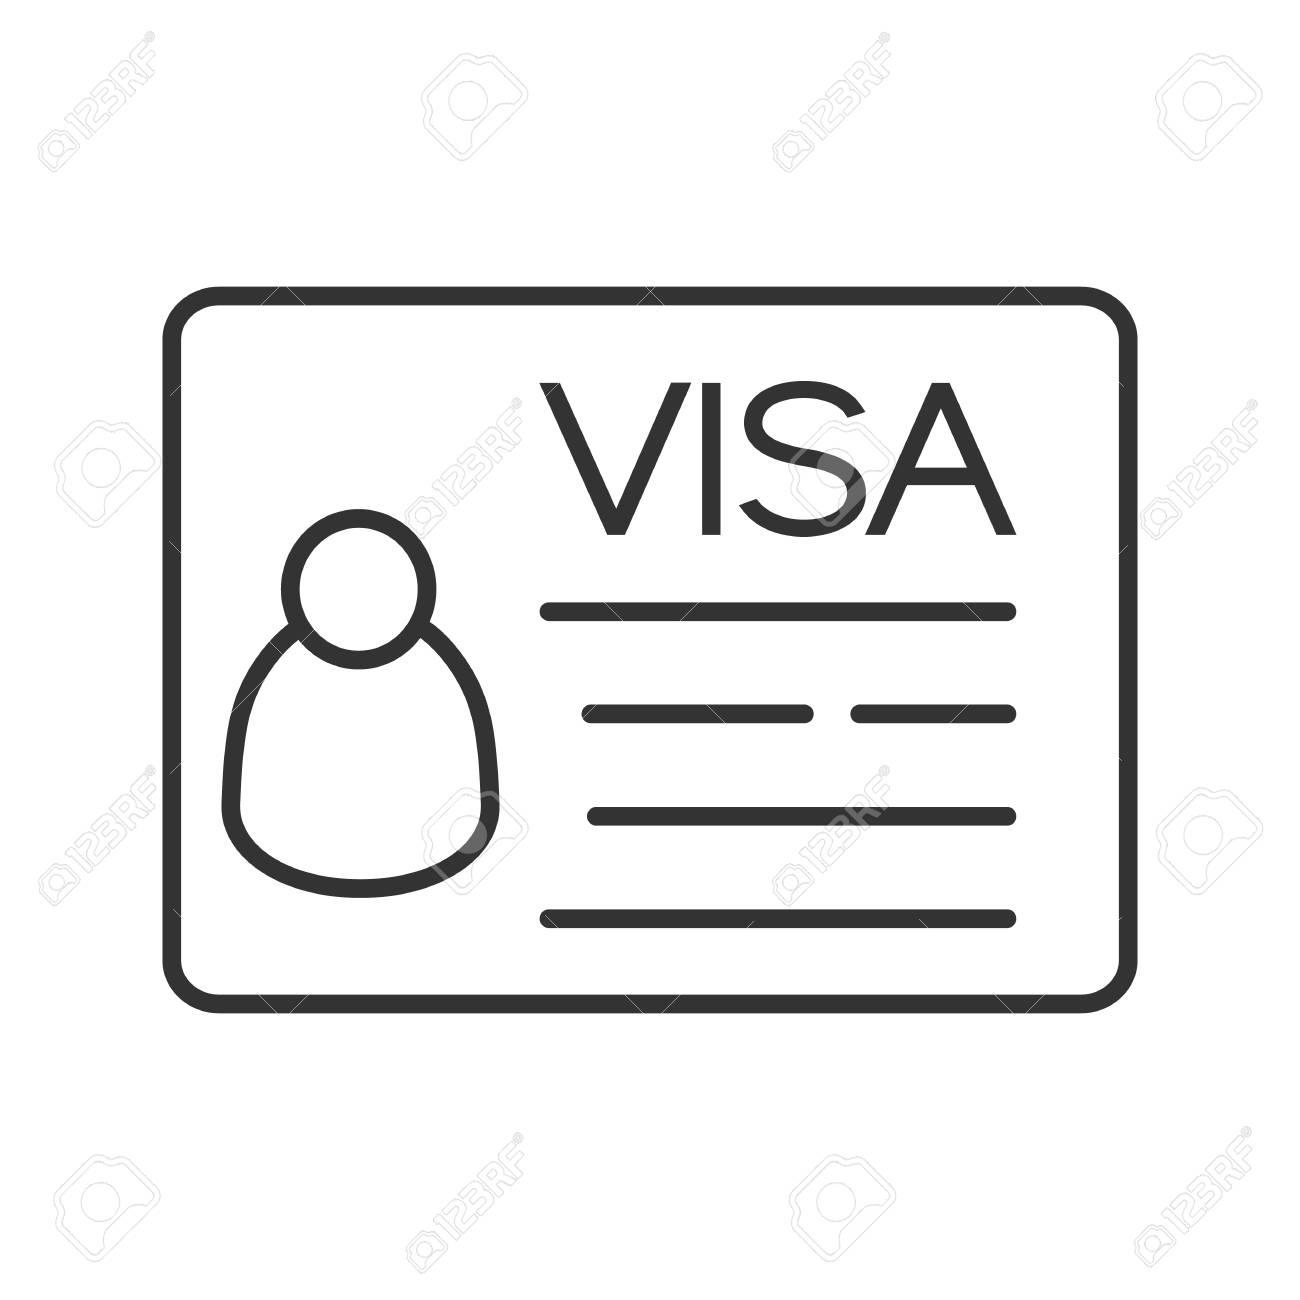 Travel Visa Linear Icon Thin Line Illustration Contour Symbol